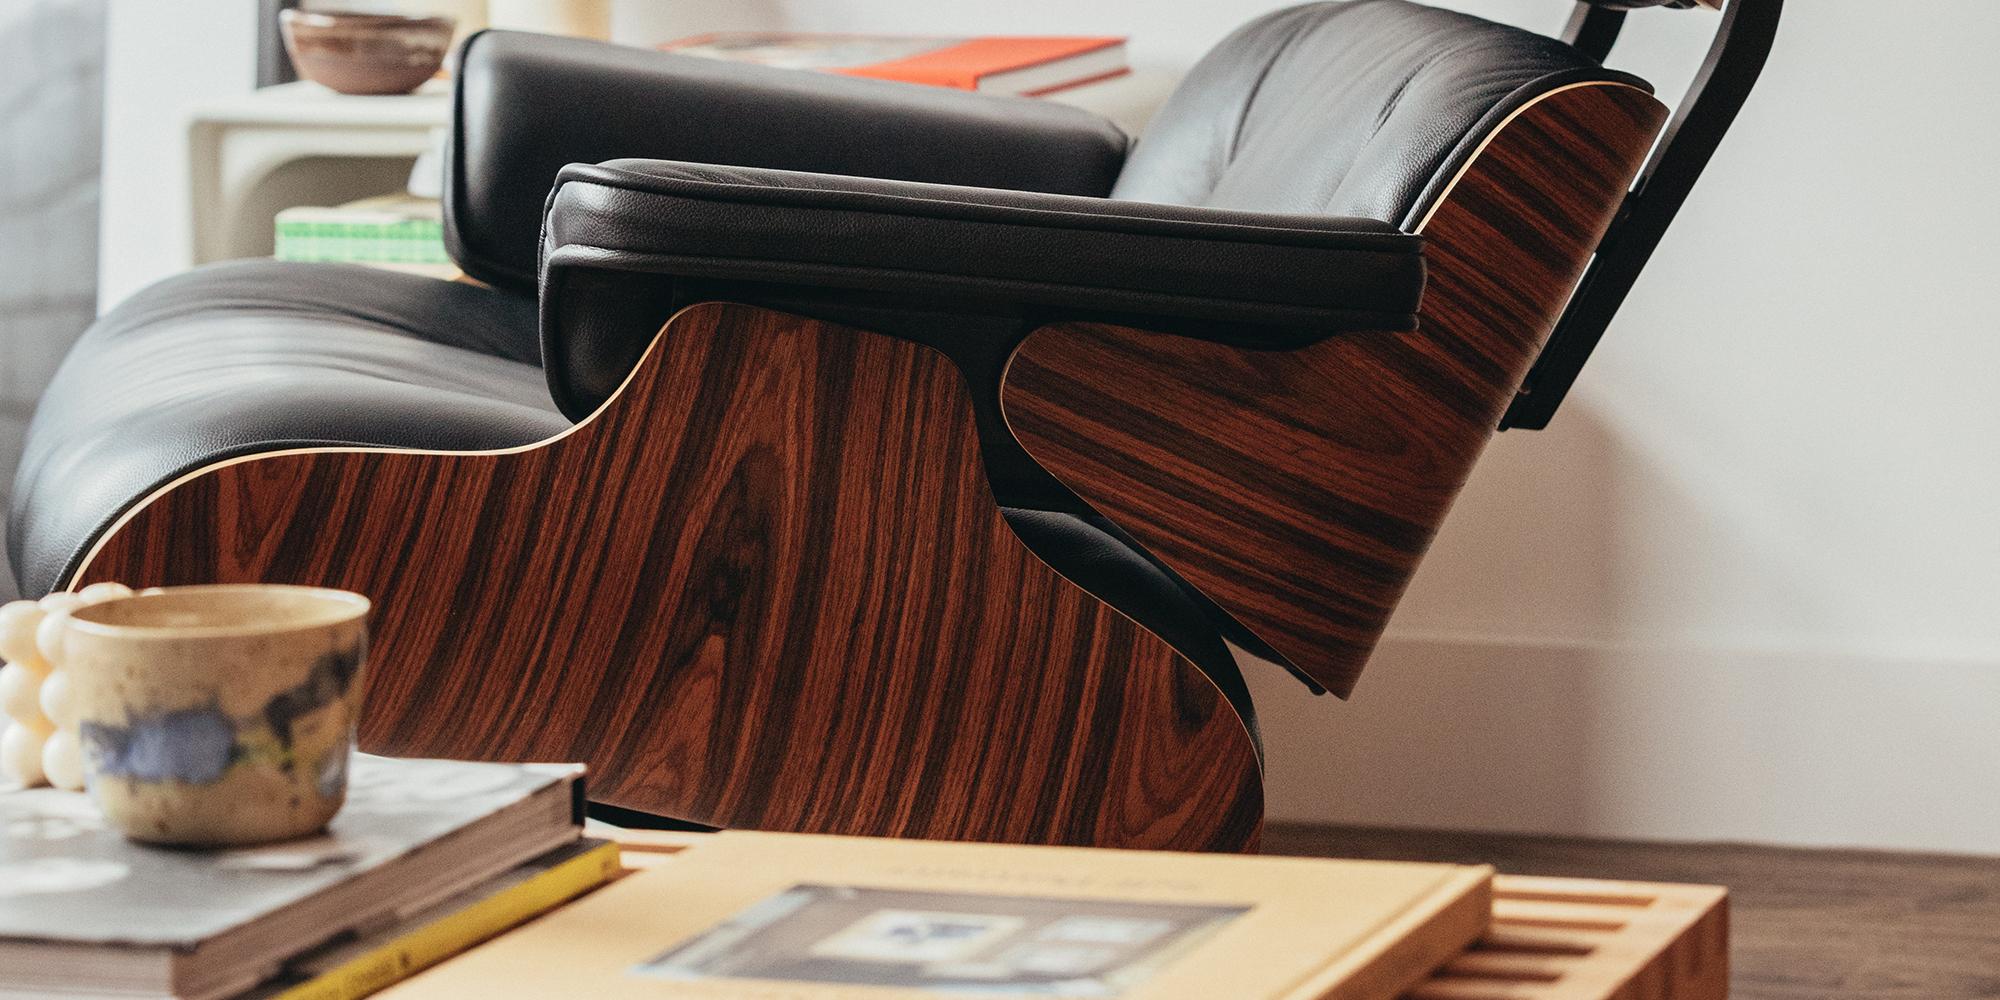 Eames Lounge Chair Close View